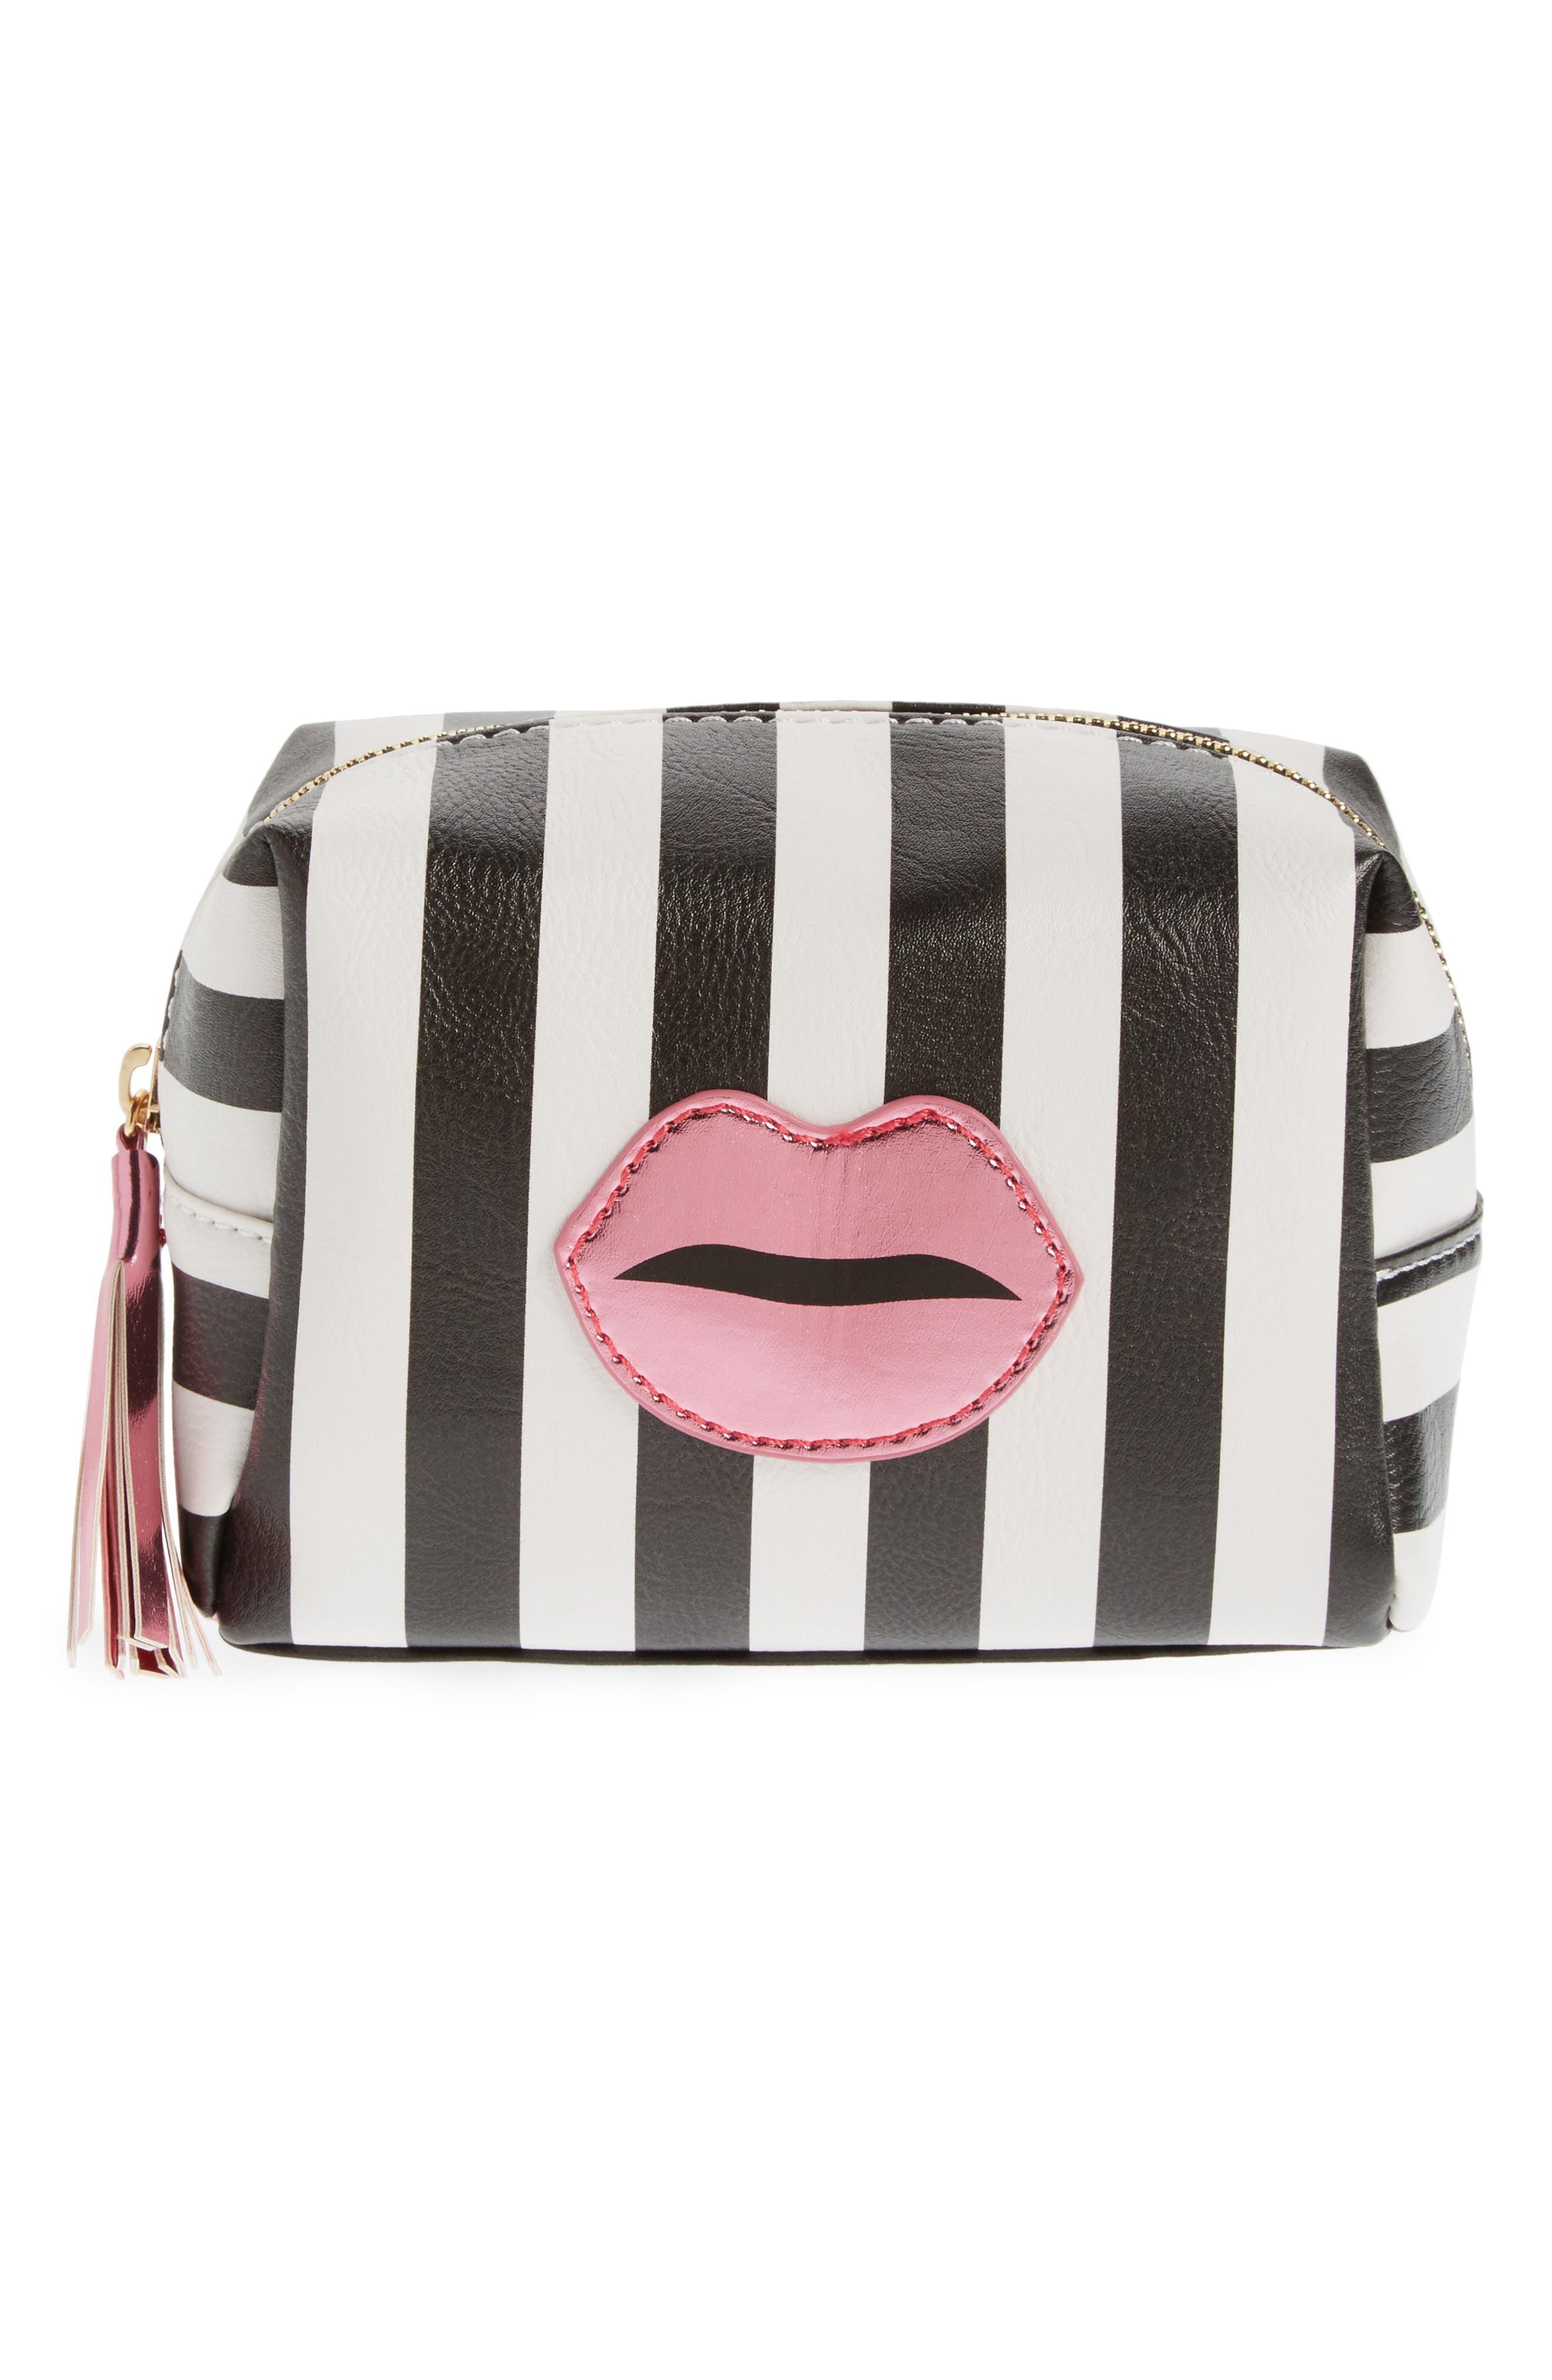 Metallic Lip Stripe Cosmetics Bag,                             Main thumbnail 1, color,                             Black/ White